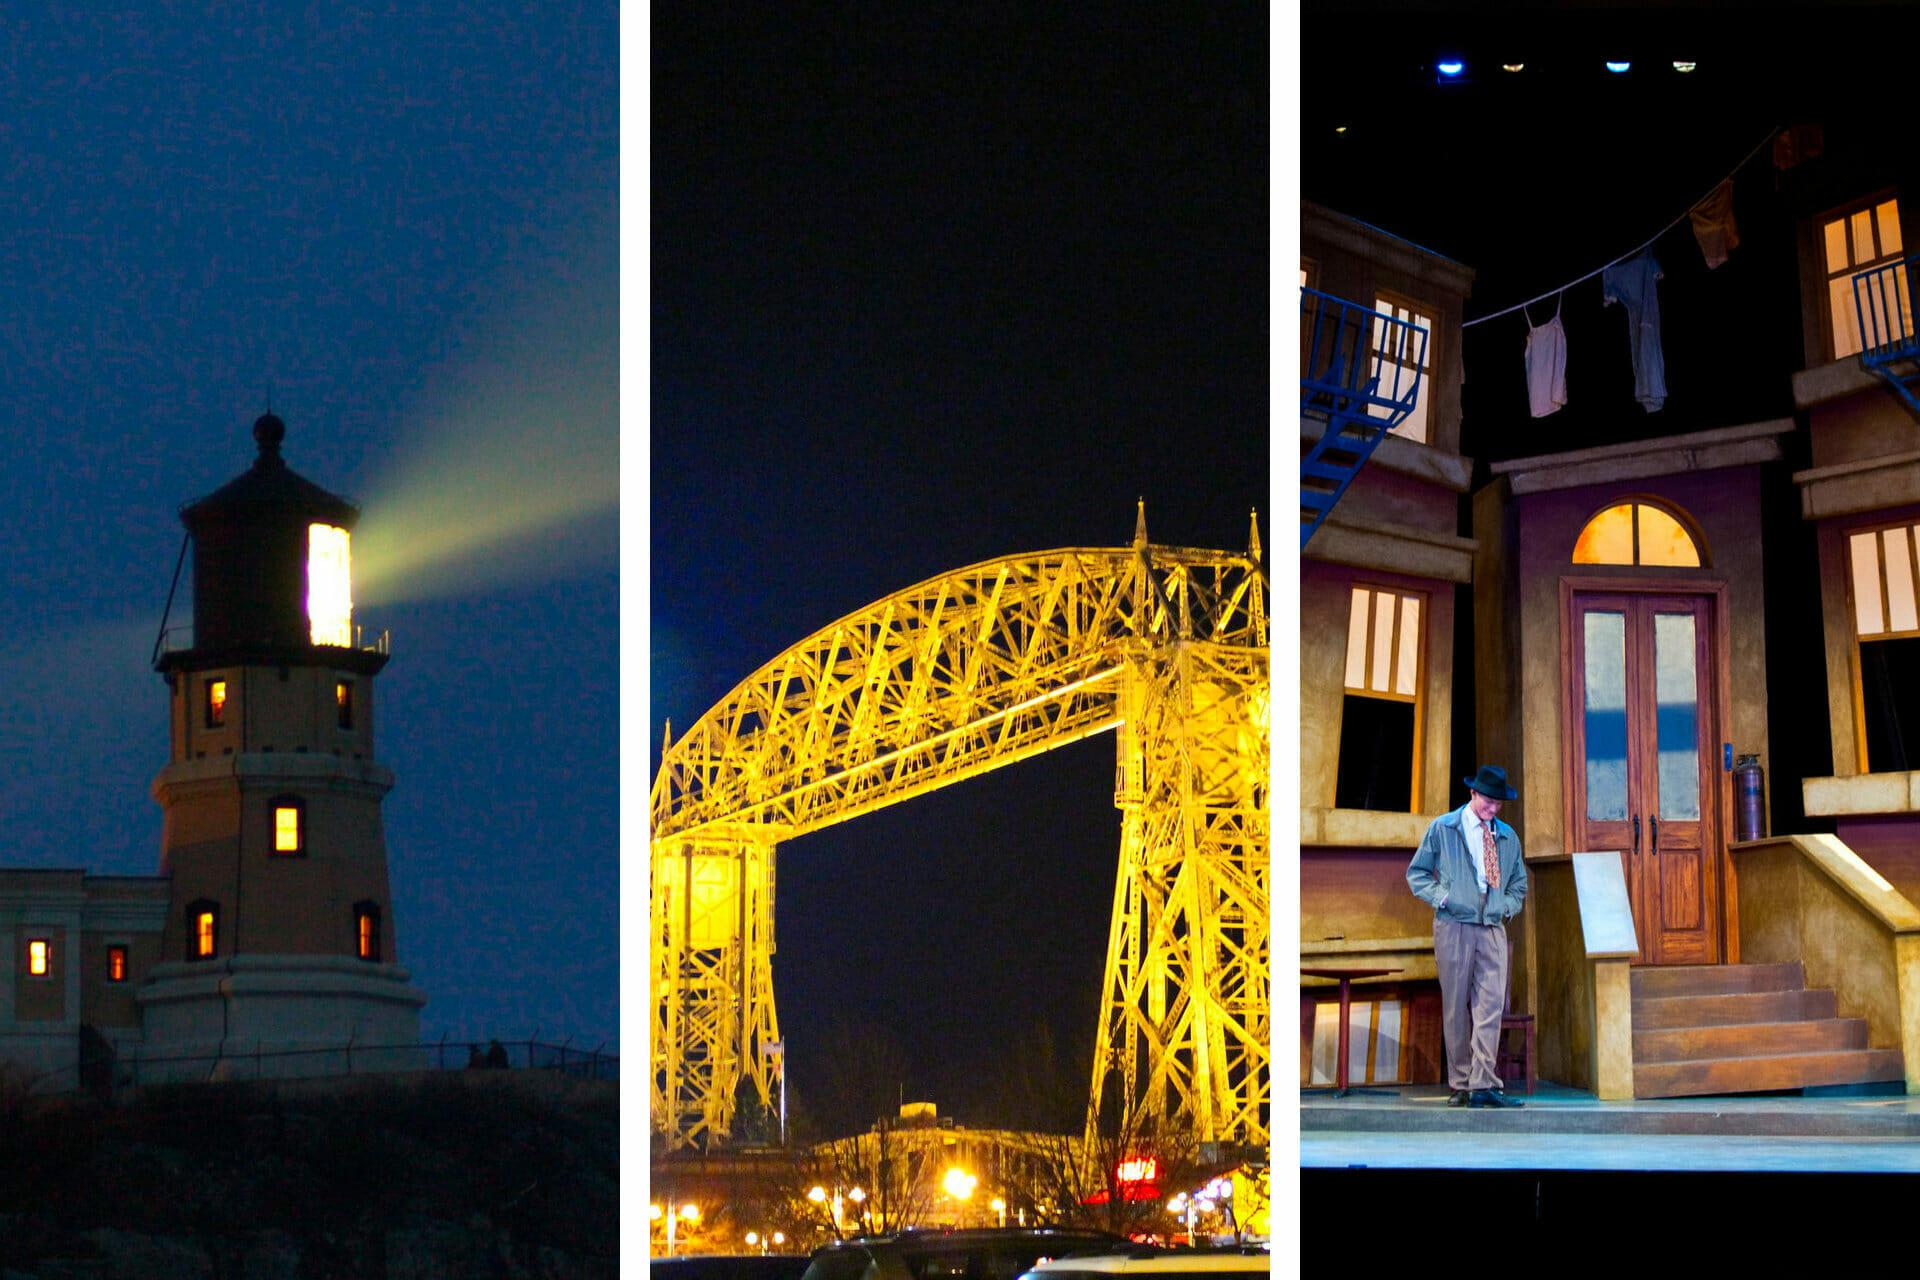 13+ Fantastic Things to Do in Duluth, Minnesota at Night (2021) via @allamericanatlas